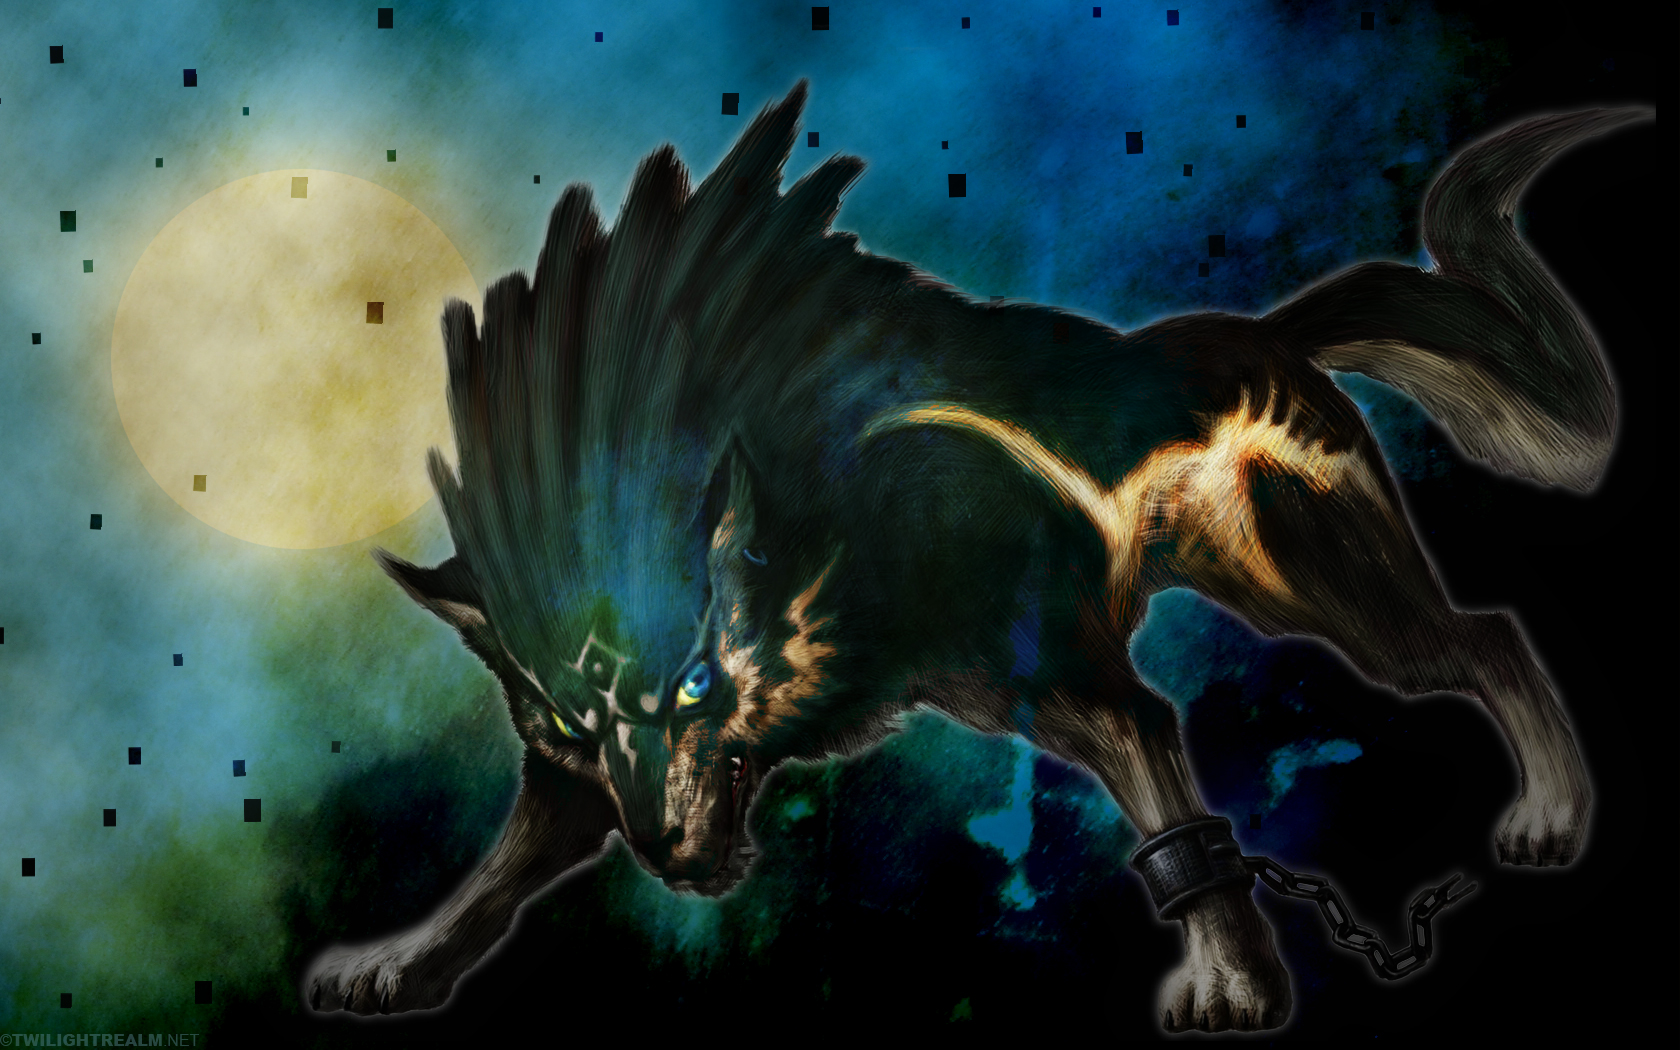 Link Wolf Wallpaper 1680x1050 Link Wolf 1680x1050